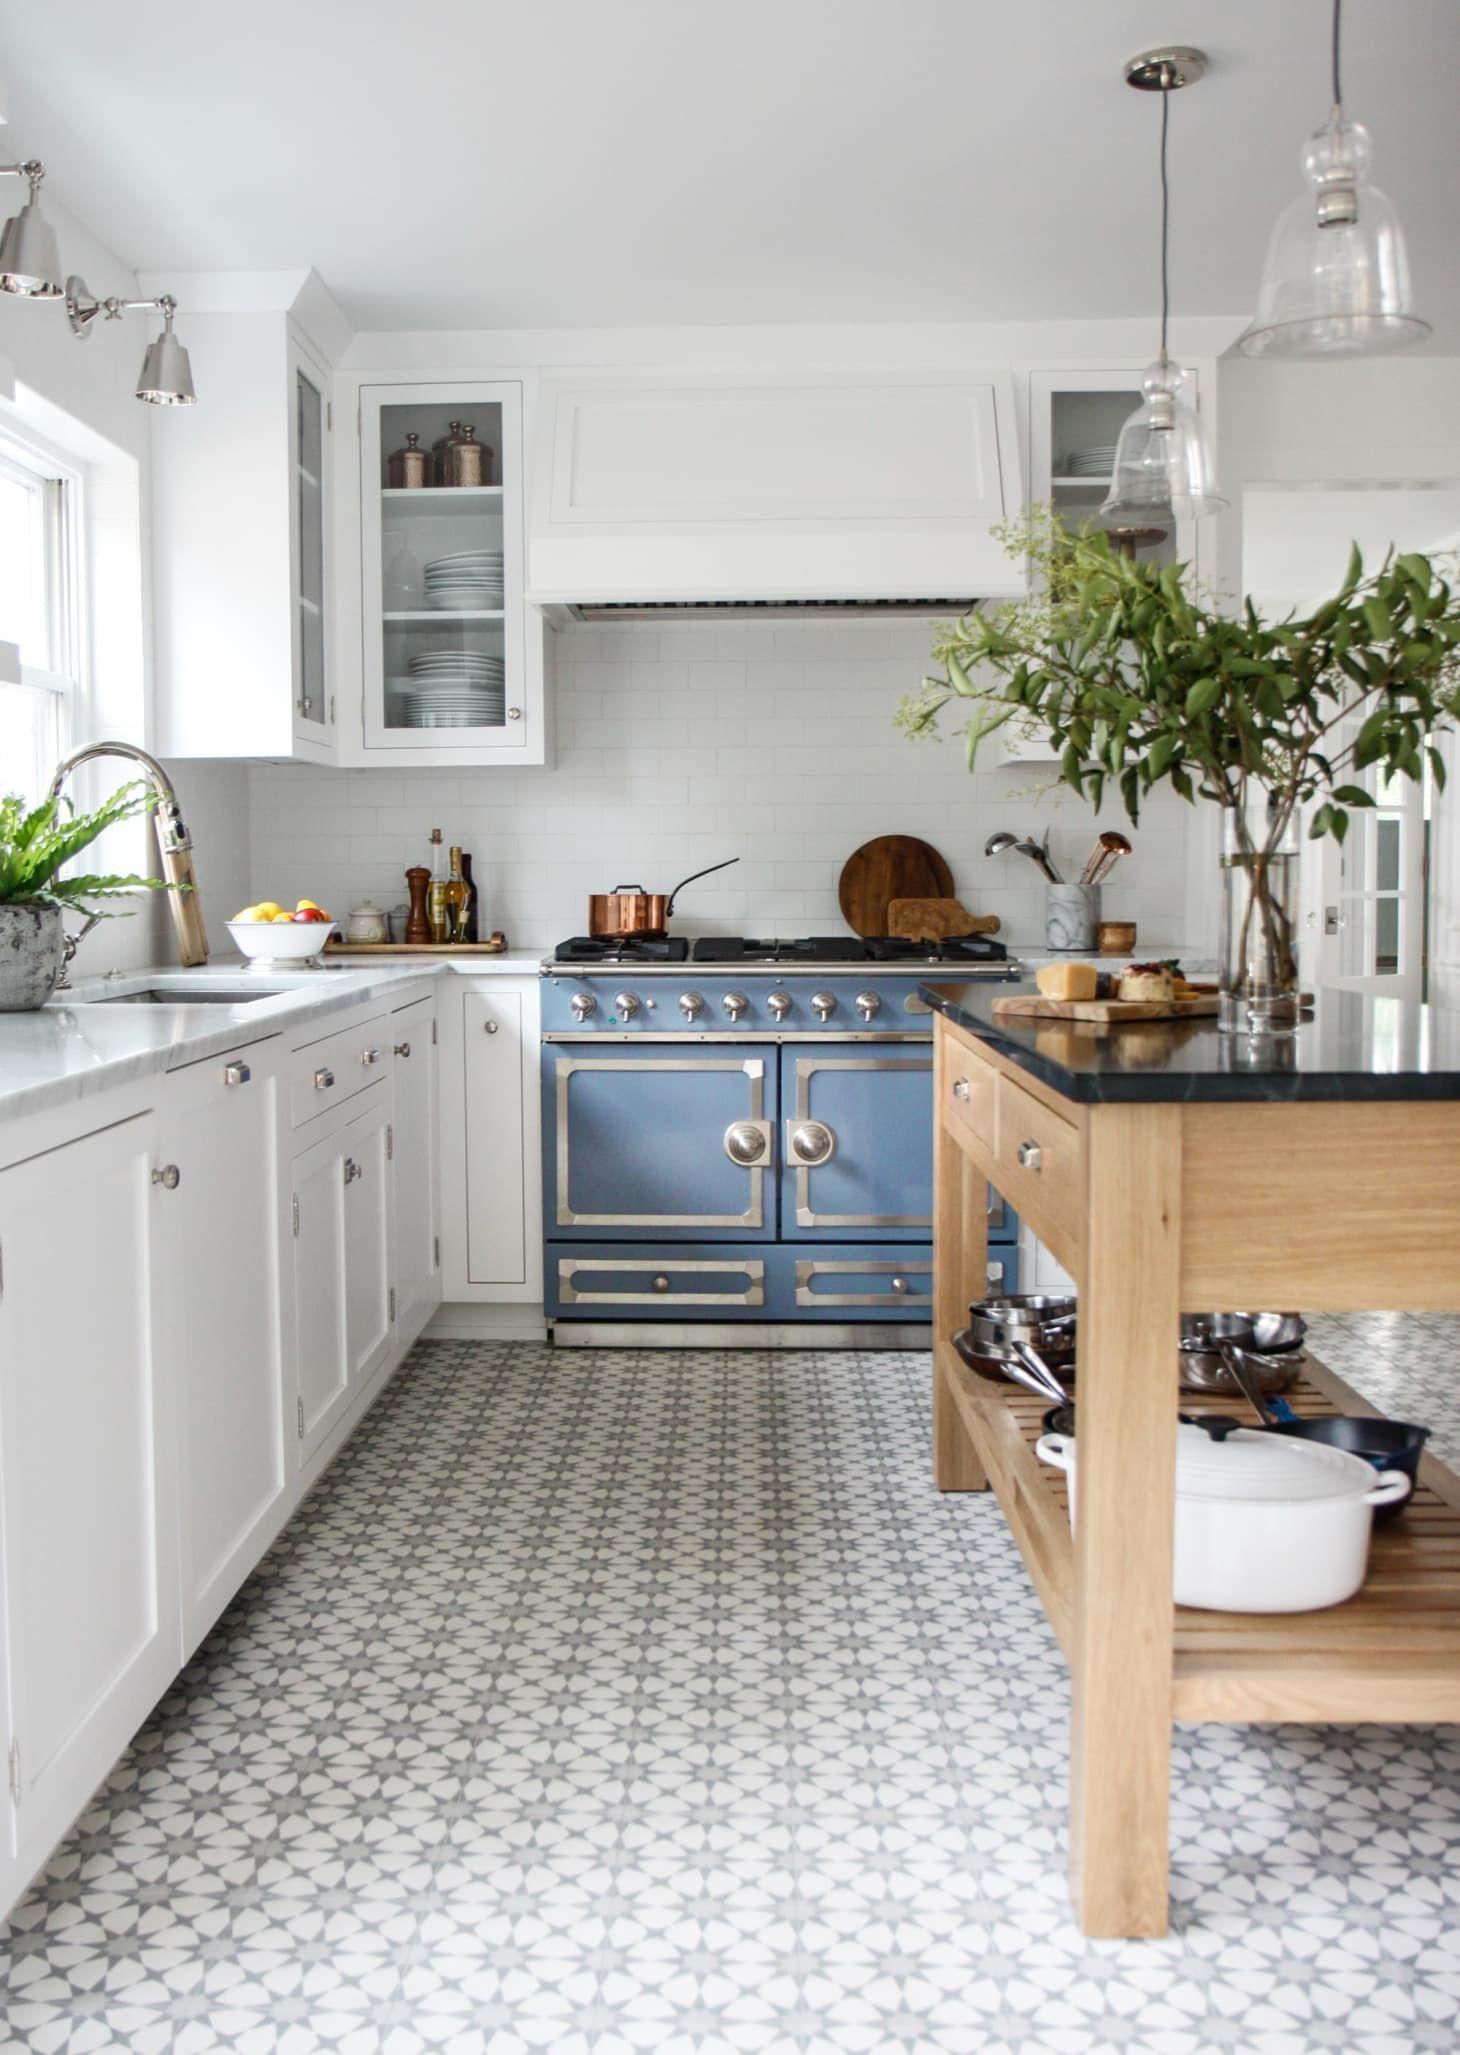 70 Tile Floor Farmhouse Kitchen Decor Ideas 55 Kitchen Remodel Small Kitchen Remodeling Projects Farmhouse Kitchen Decor